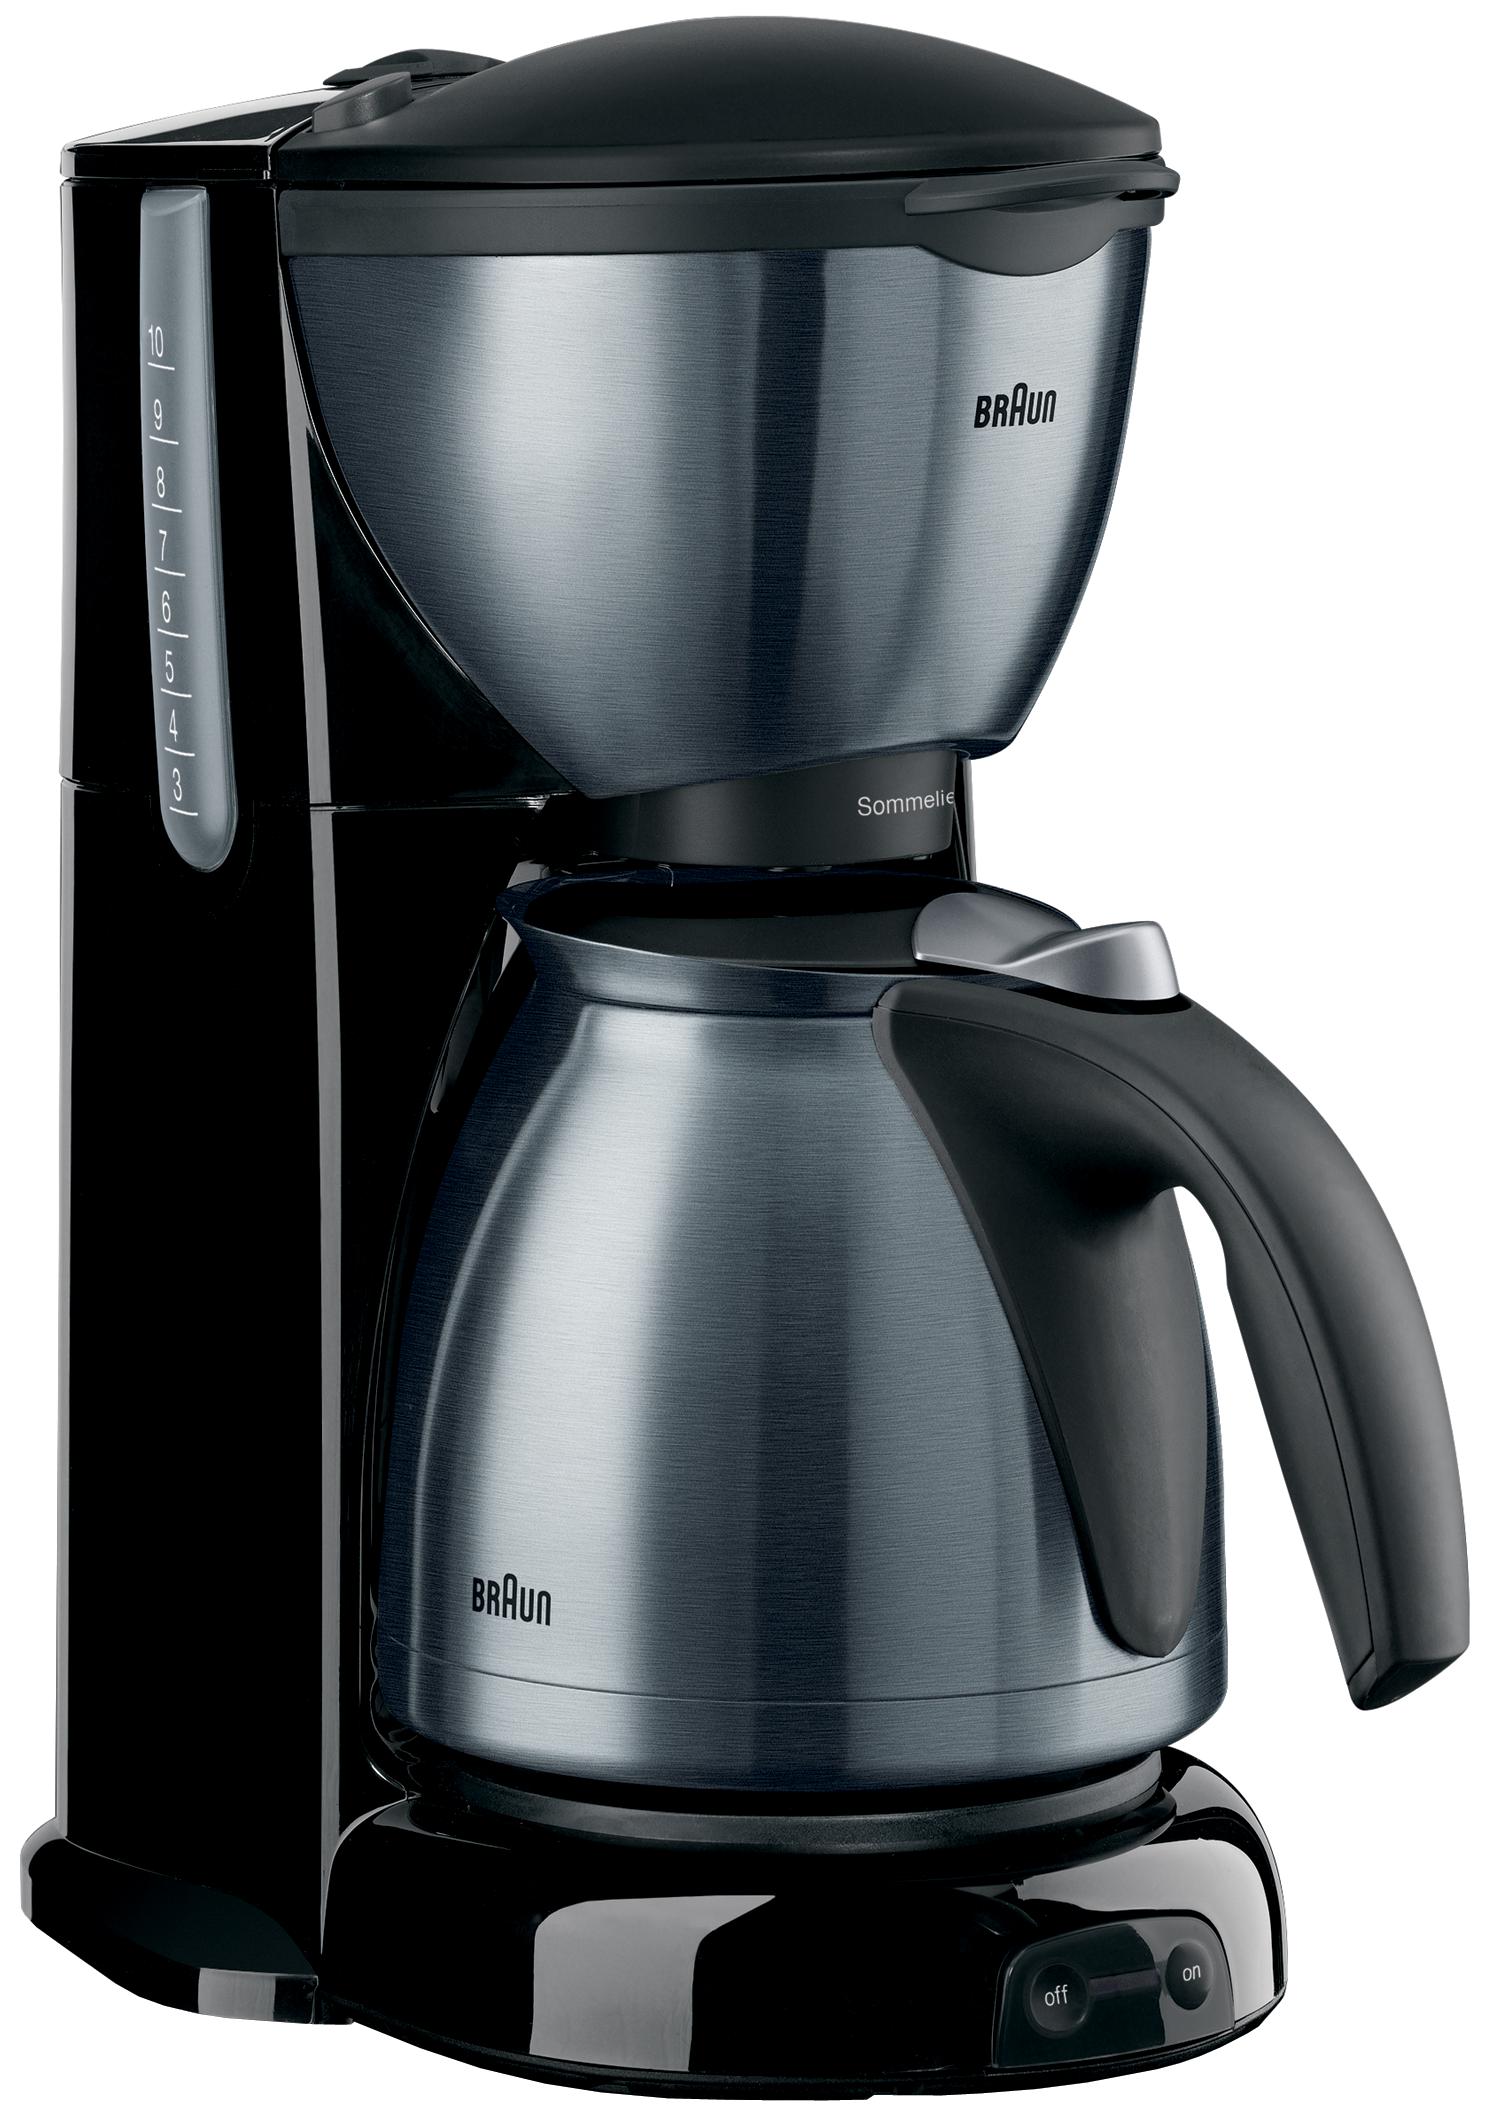 Coffee Maker Stainless Steel Jug : Braun KF610 220 Volt Coffee Maker with Stainless Steel Jug